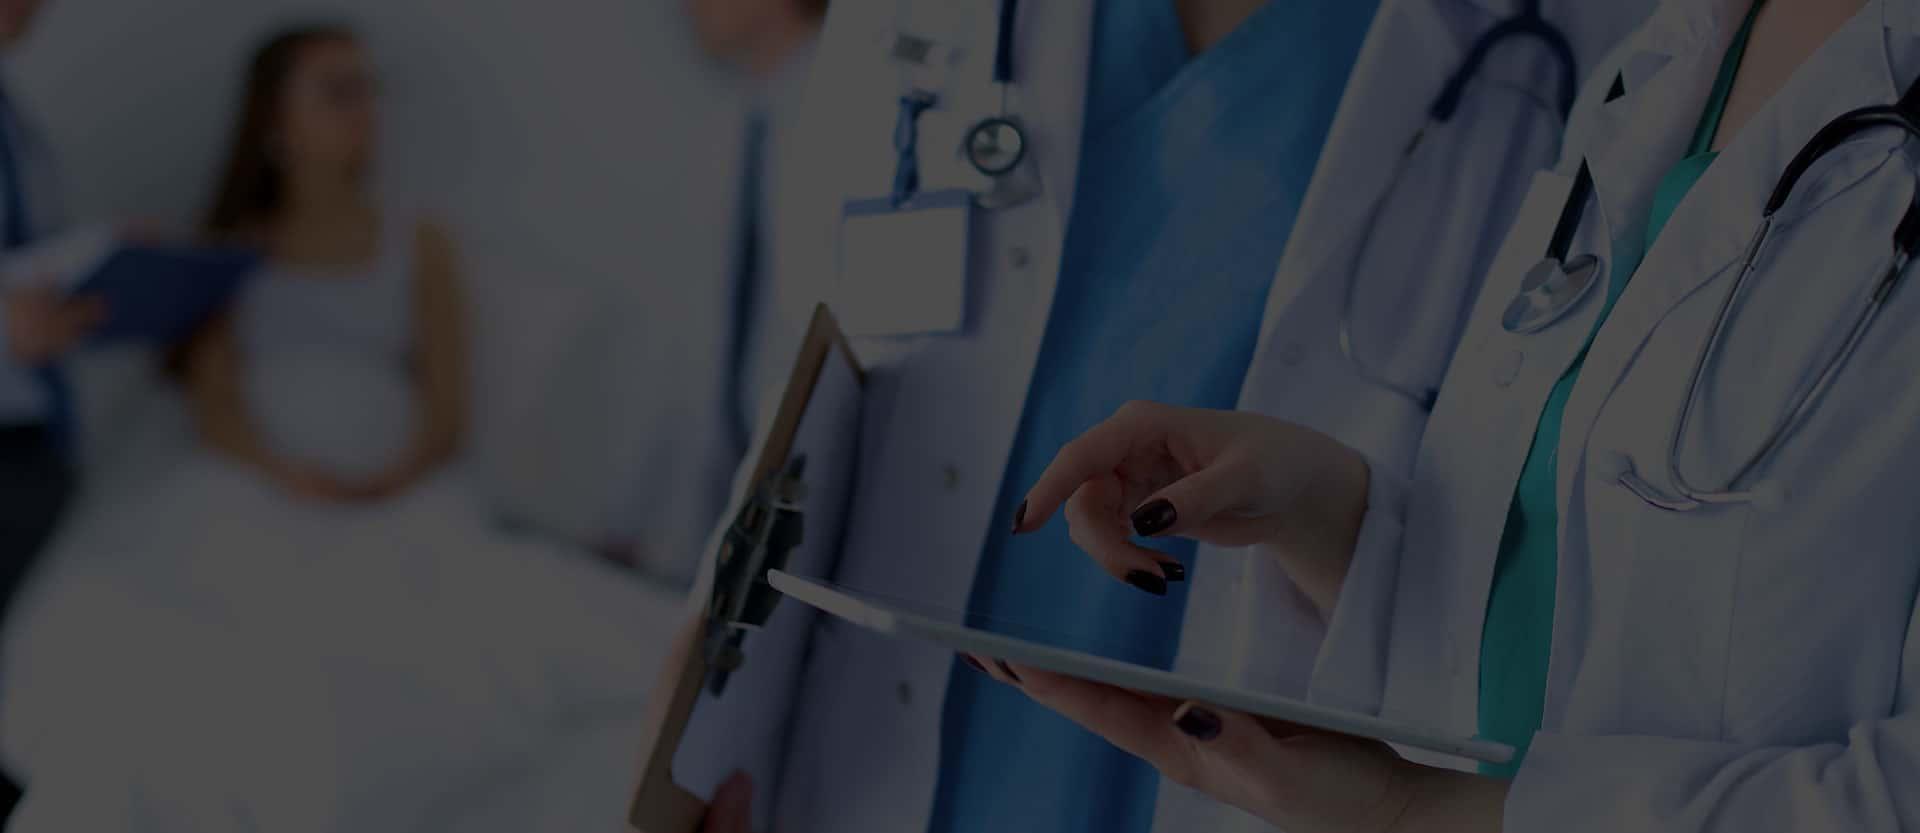 Patient Verification Solutions for Healthcare